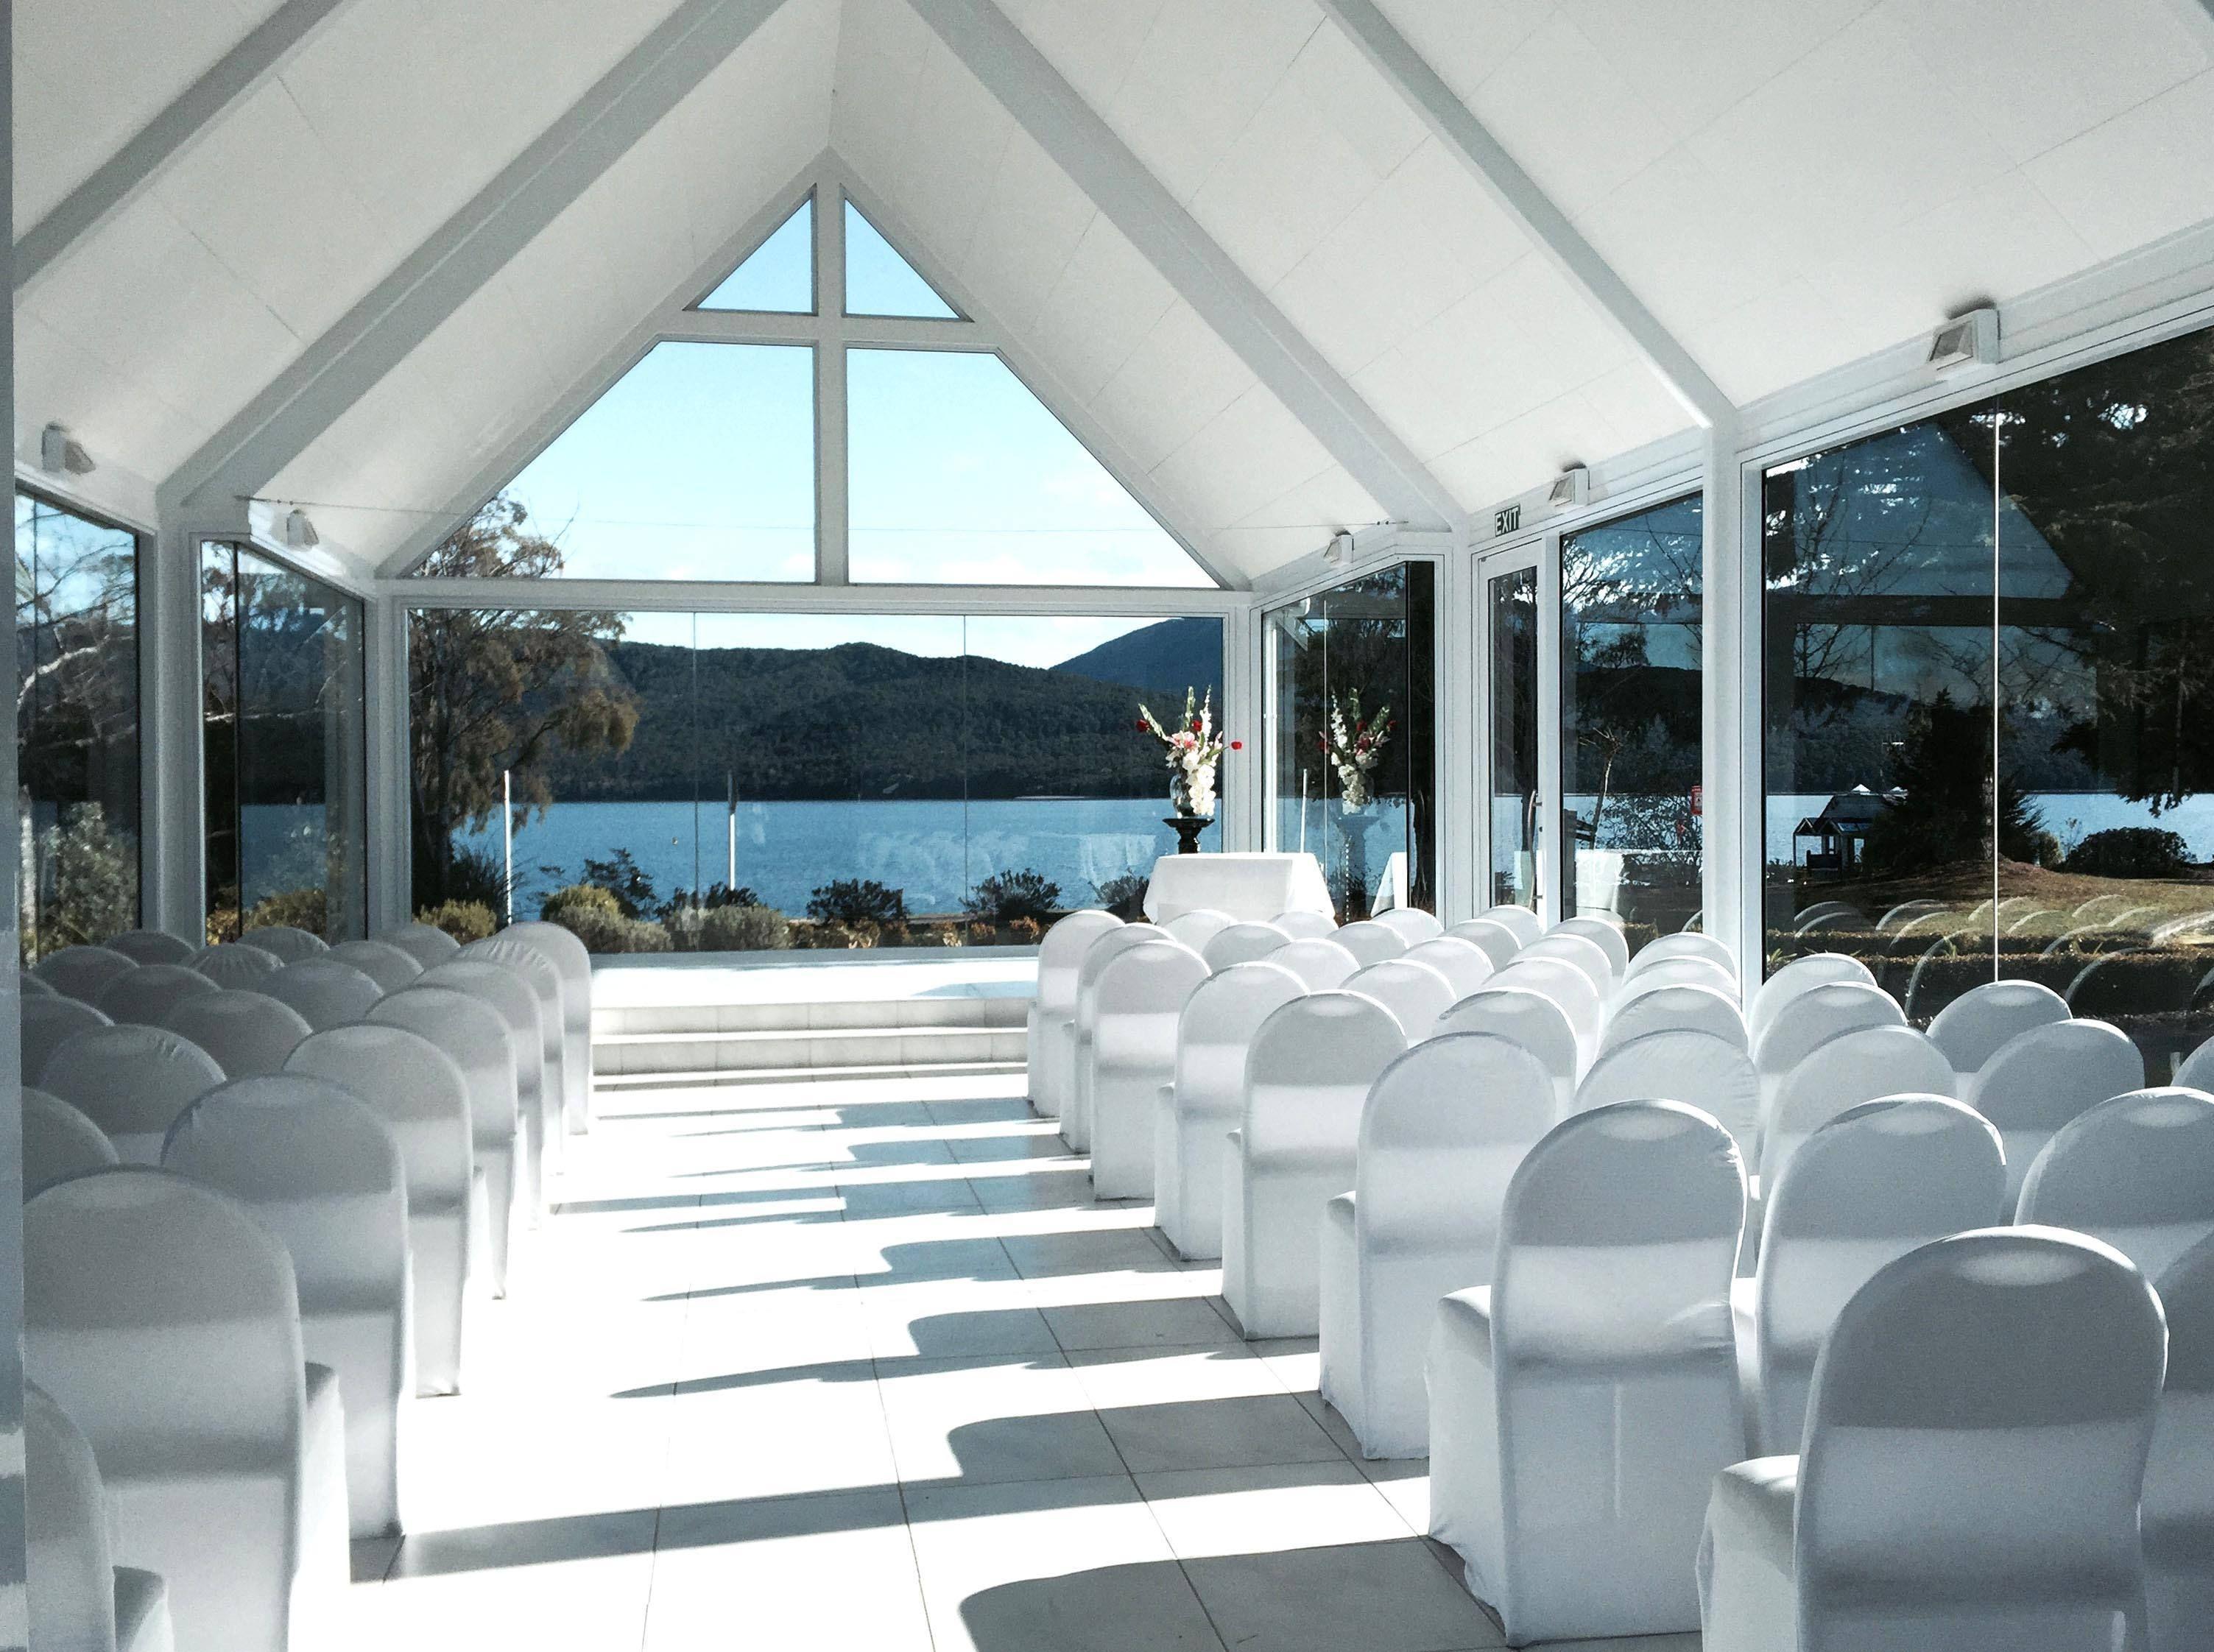 Outdoor wedding venues in new zealand google search httpwww outdoor wedding venues in new zealand google search httpweddingteanau junglespirit Image collections